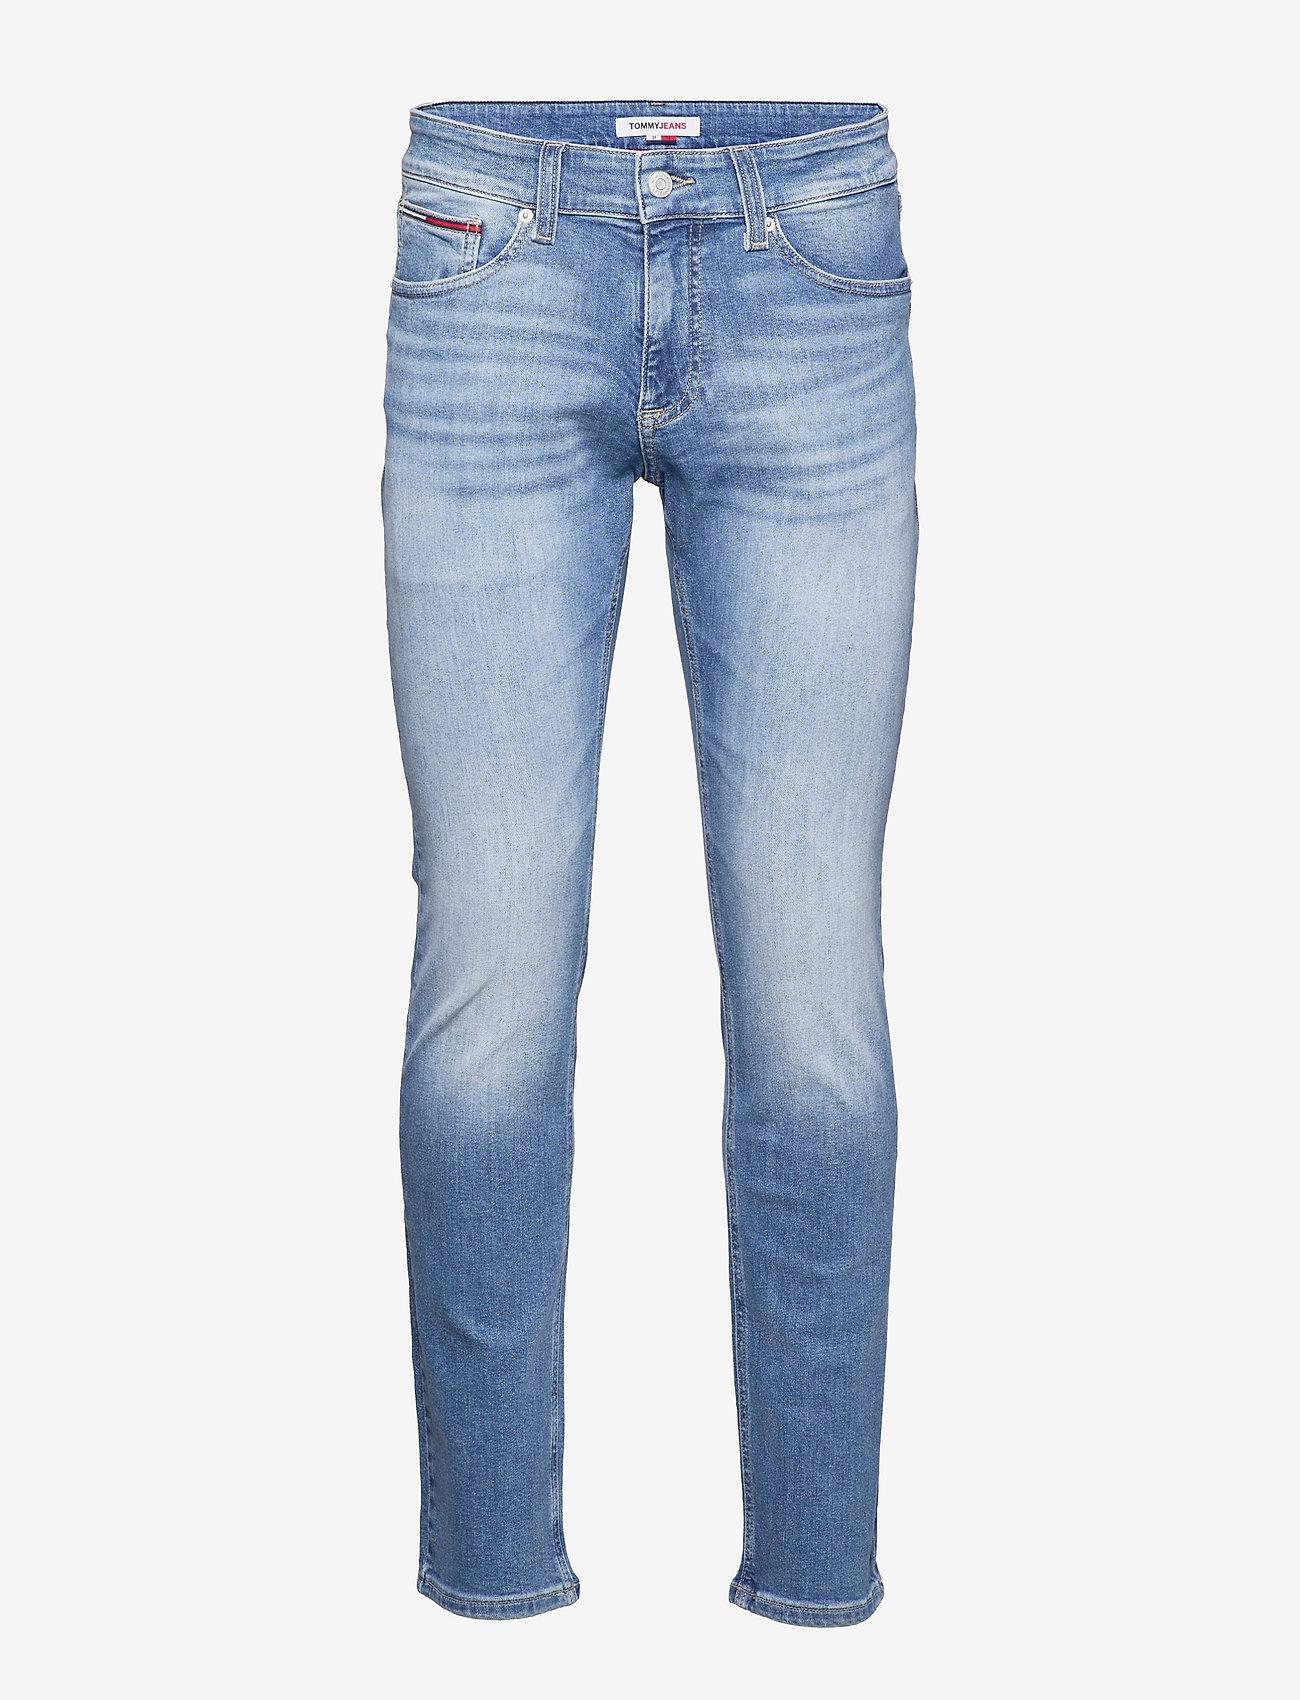 Tommy Jeans - SCANTON SLIM AE118 LBS - slim jeans - denim light - 0